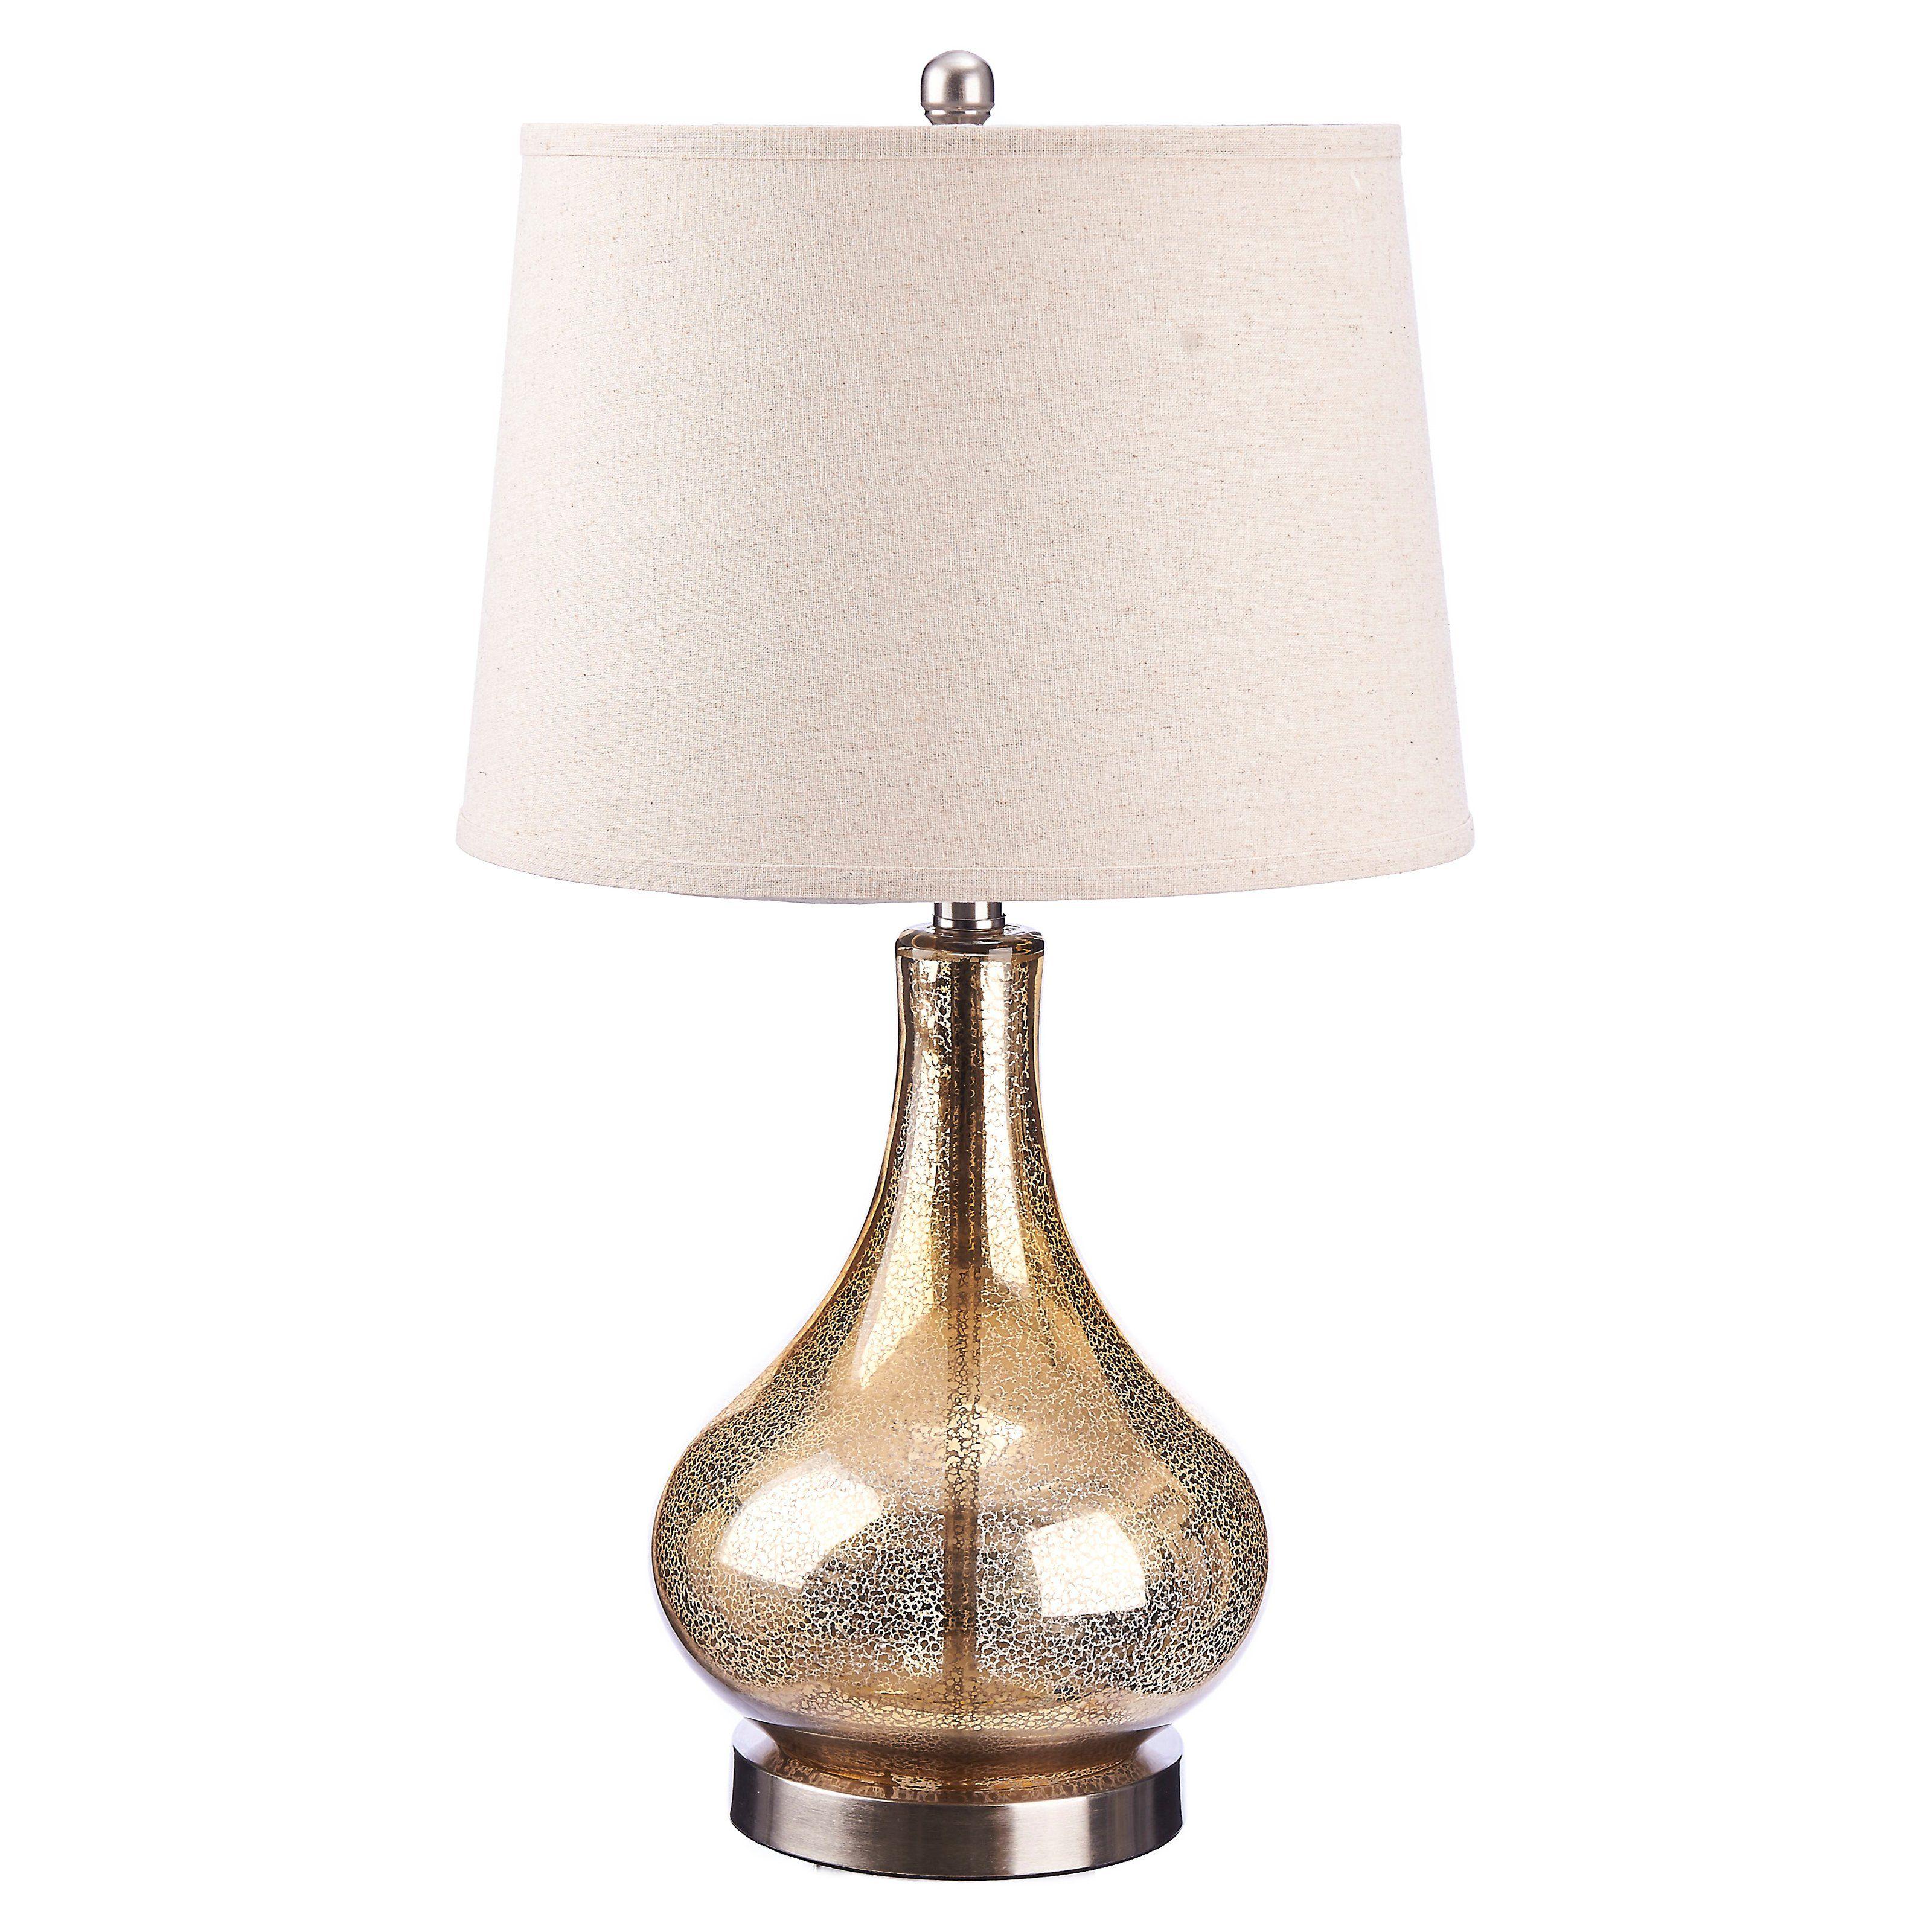 Catalina Lighting 3 Way Gold Mercury Glass Gourd Table Lamp 19560 005 Table Lamp Gold Mercury Glass Mercury Glass Lamp